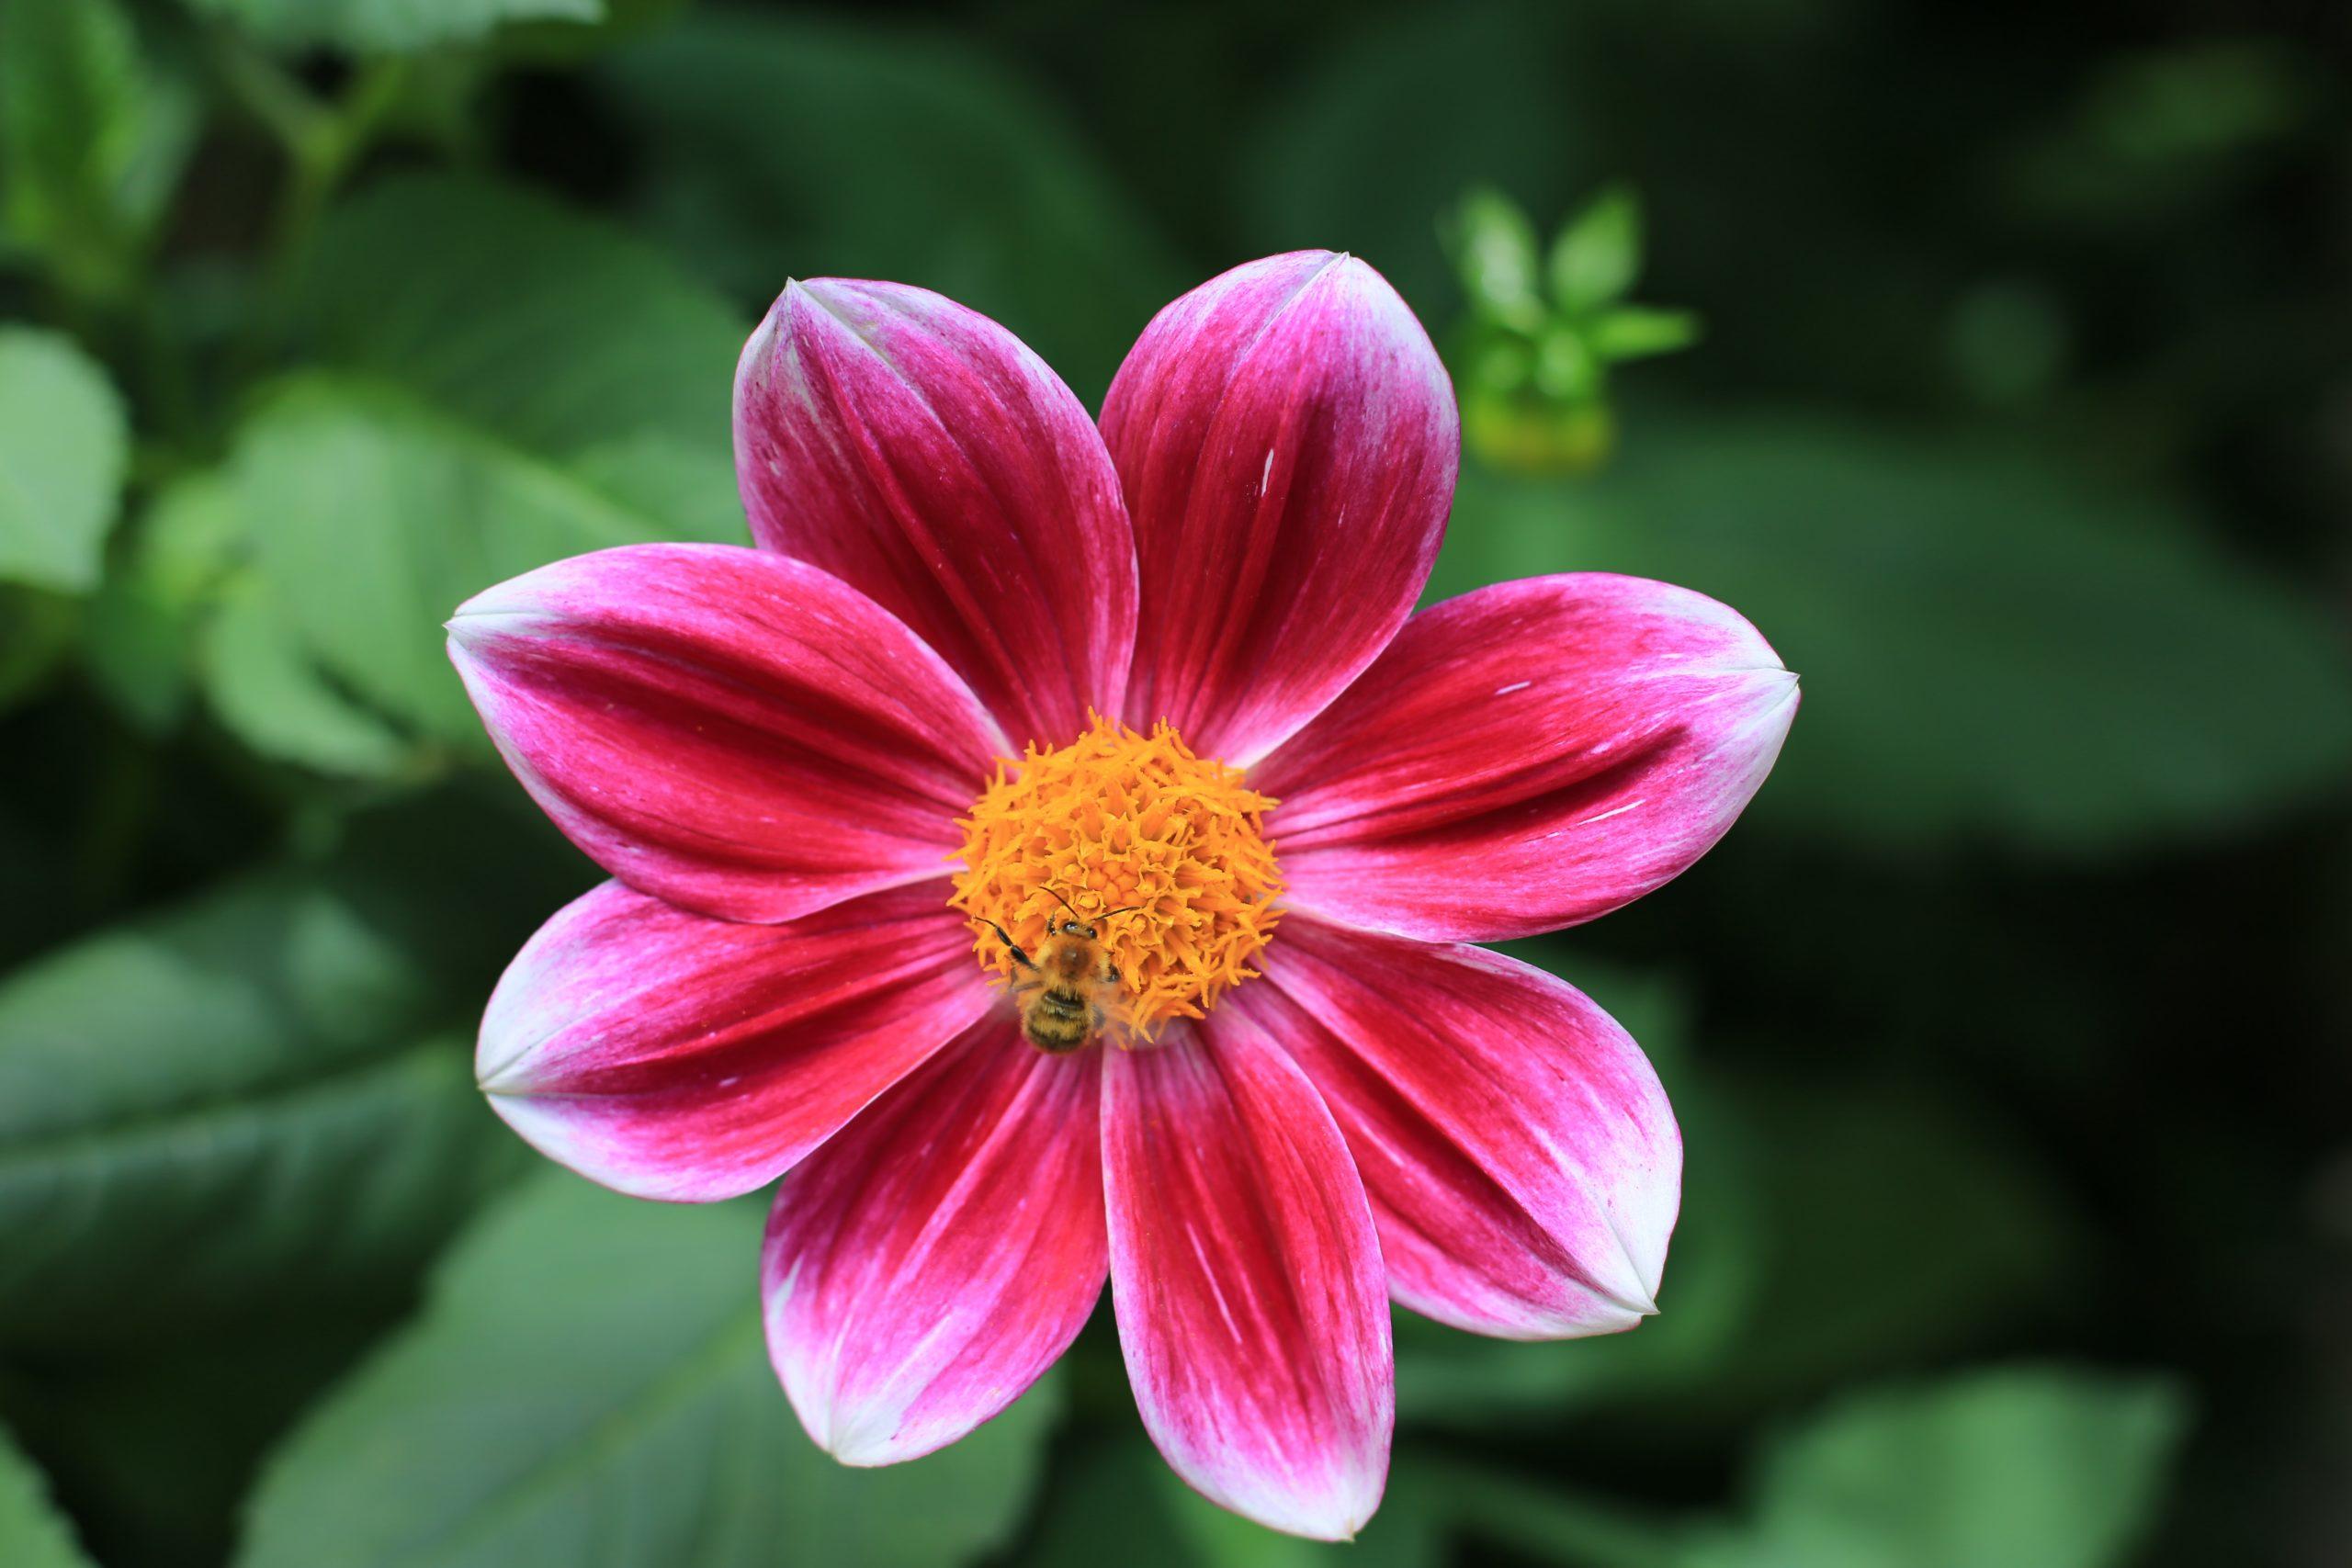 Pinke Blume mit Biene